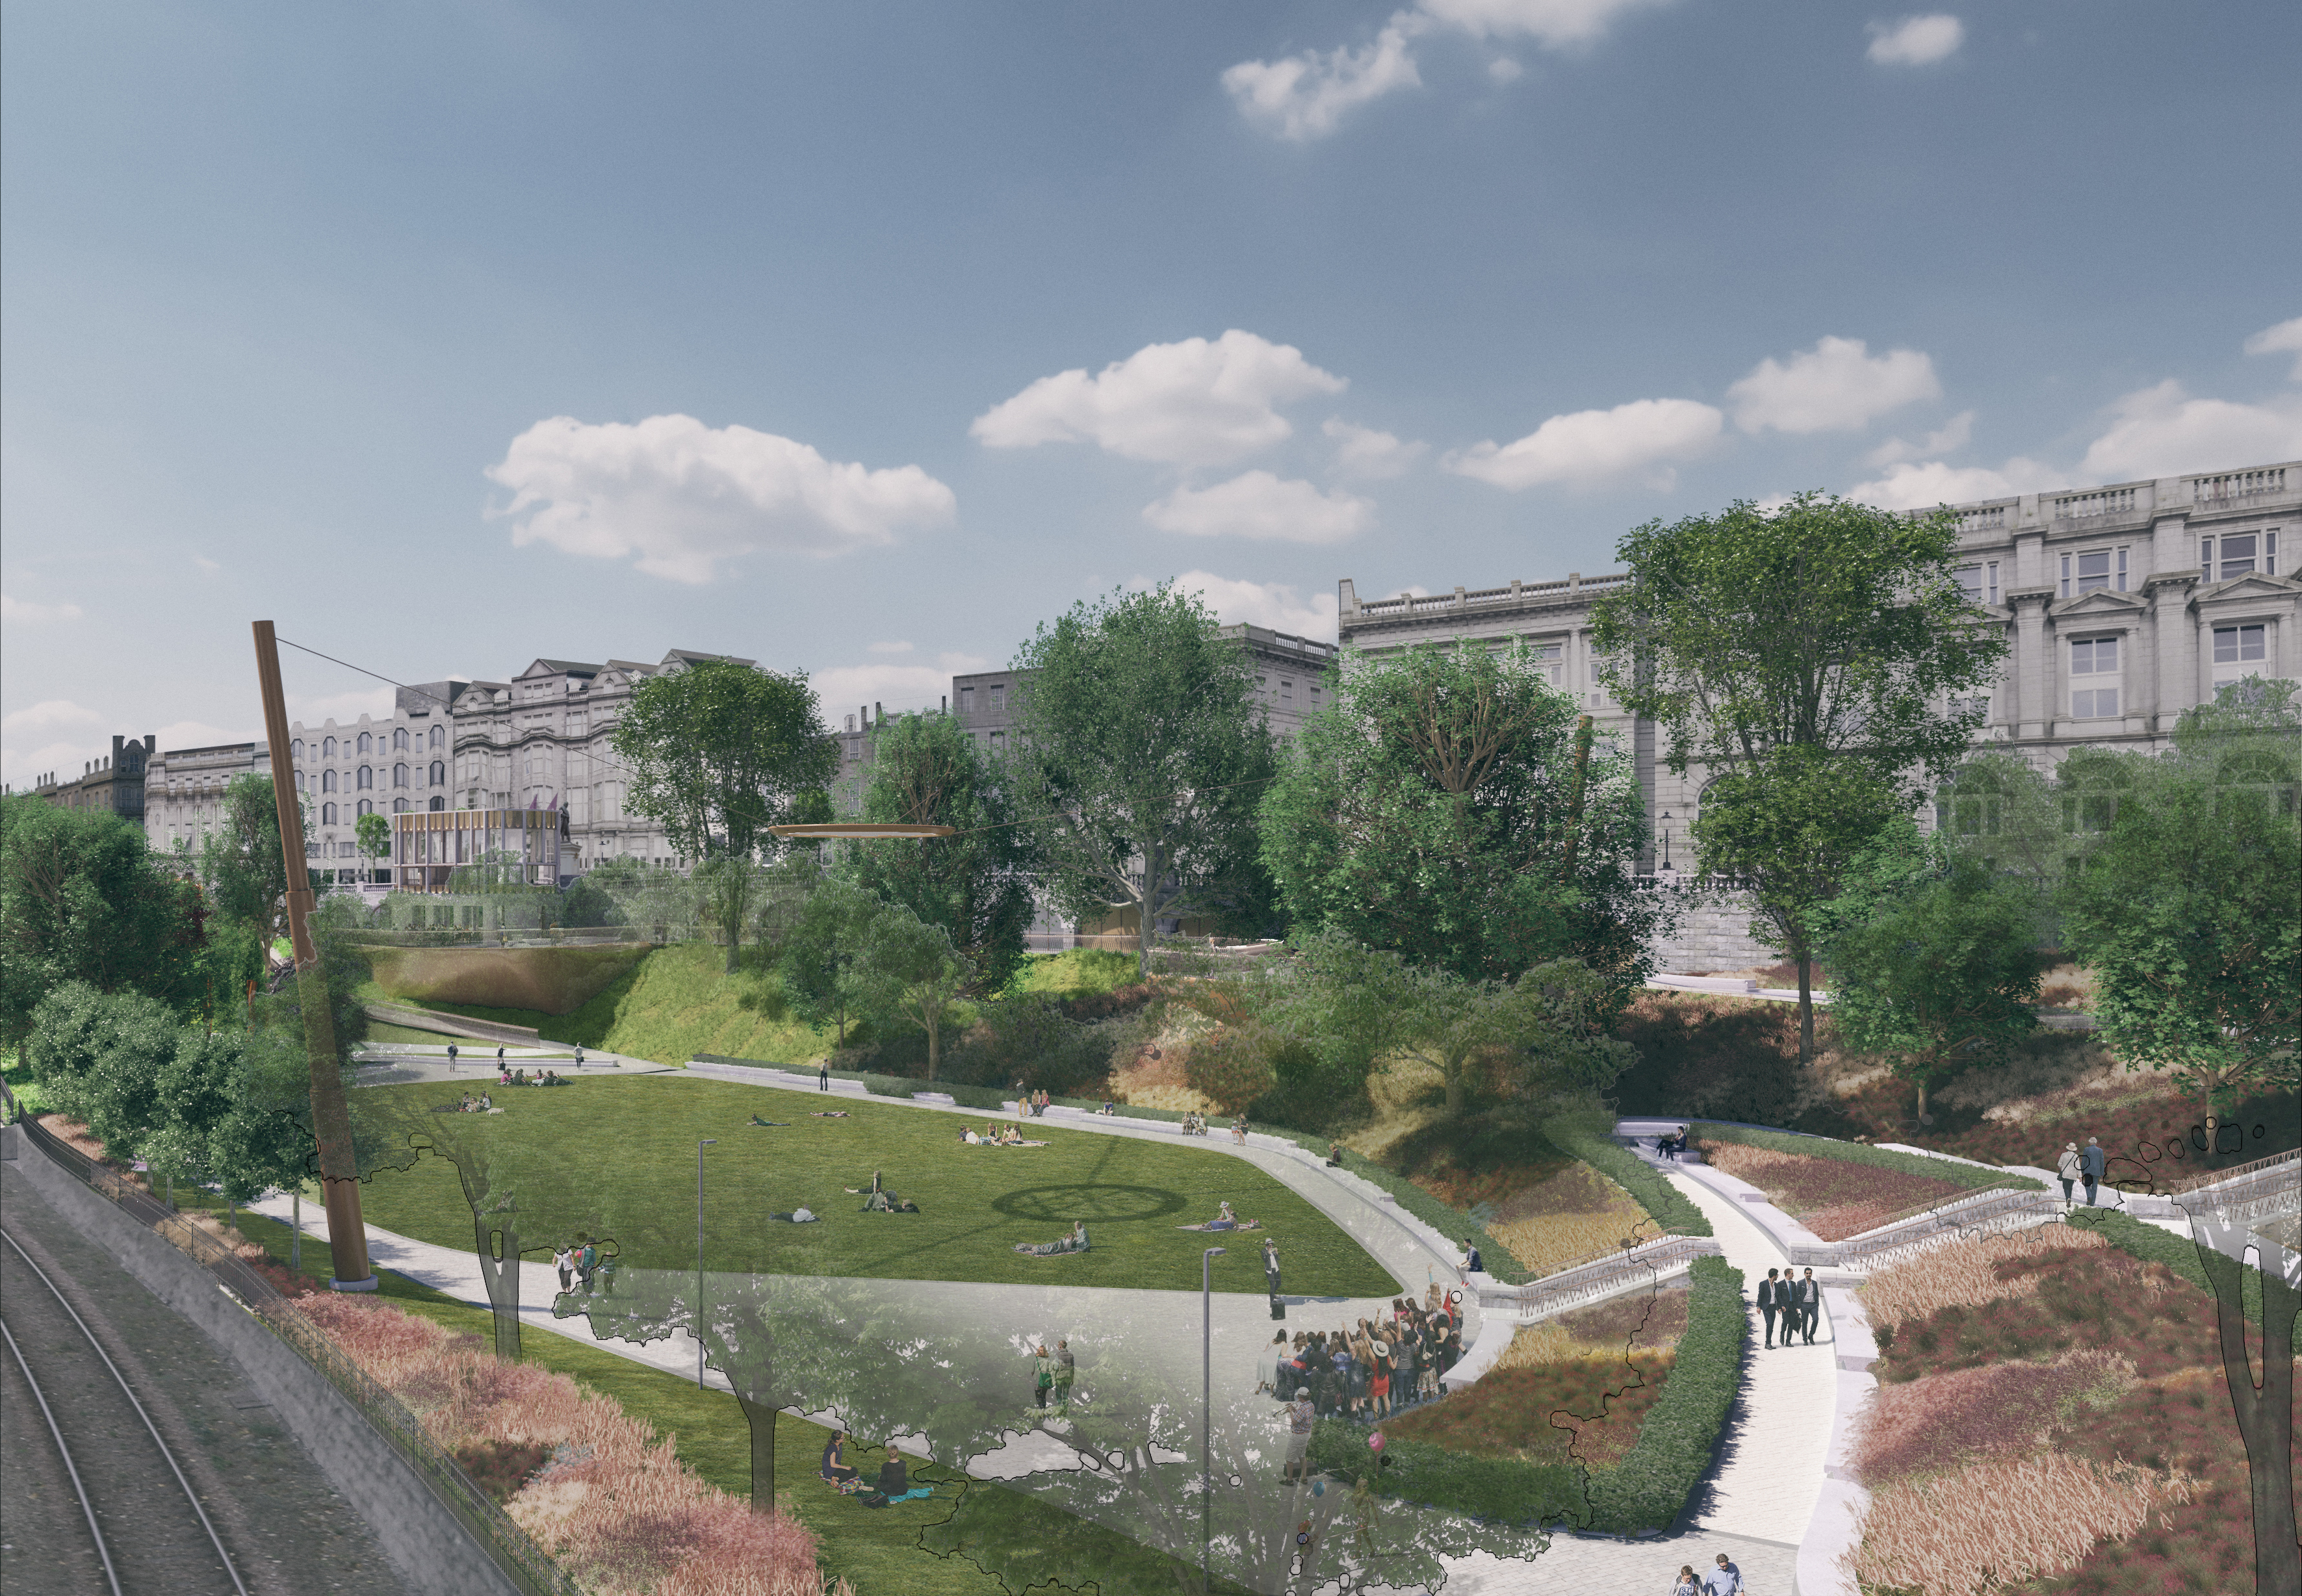 The plans for Union Terrace Gardens